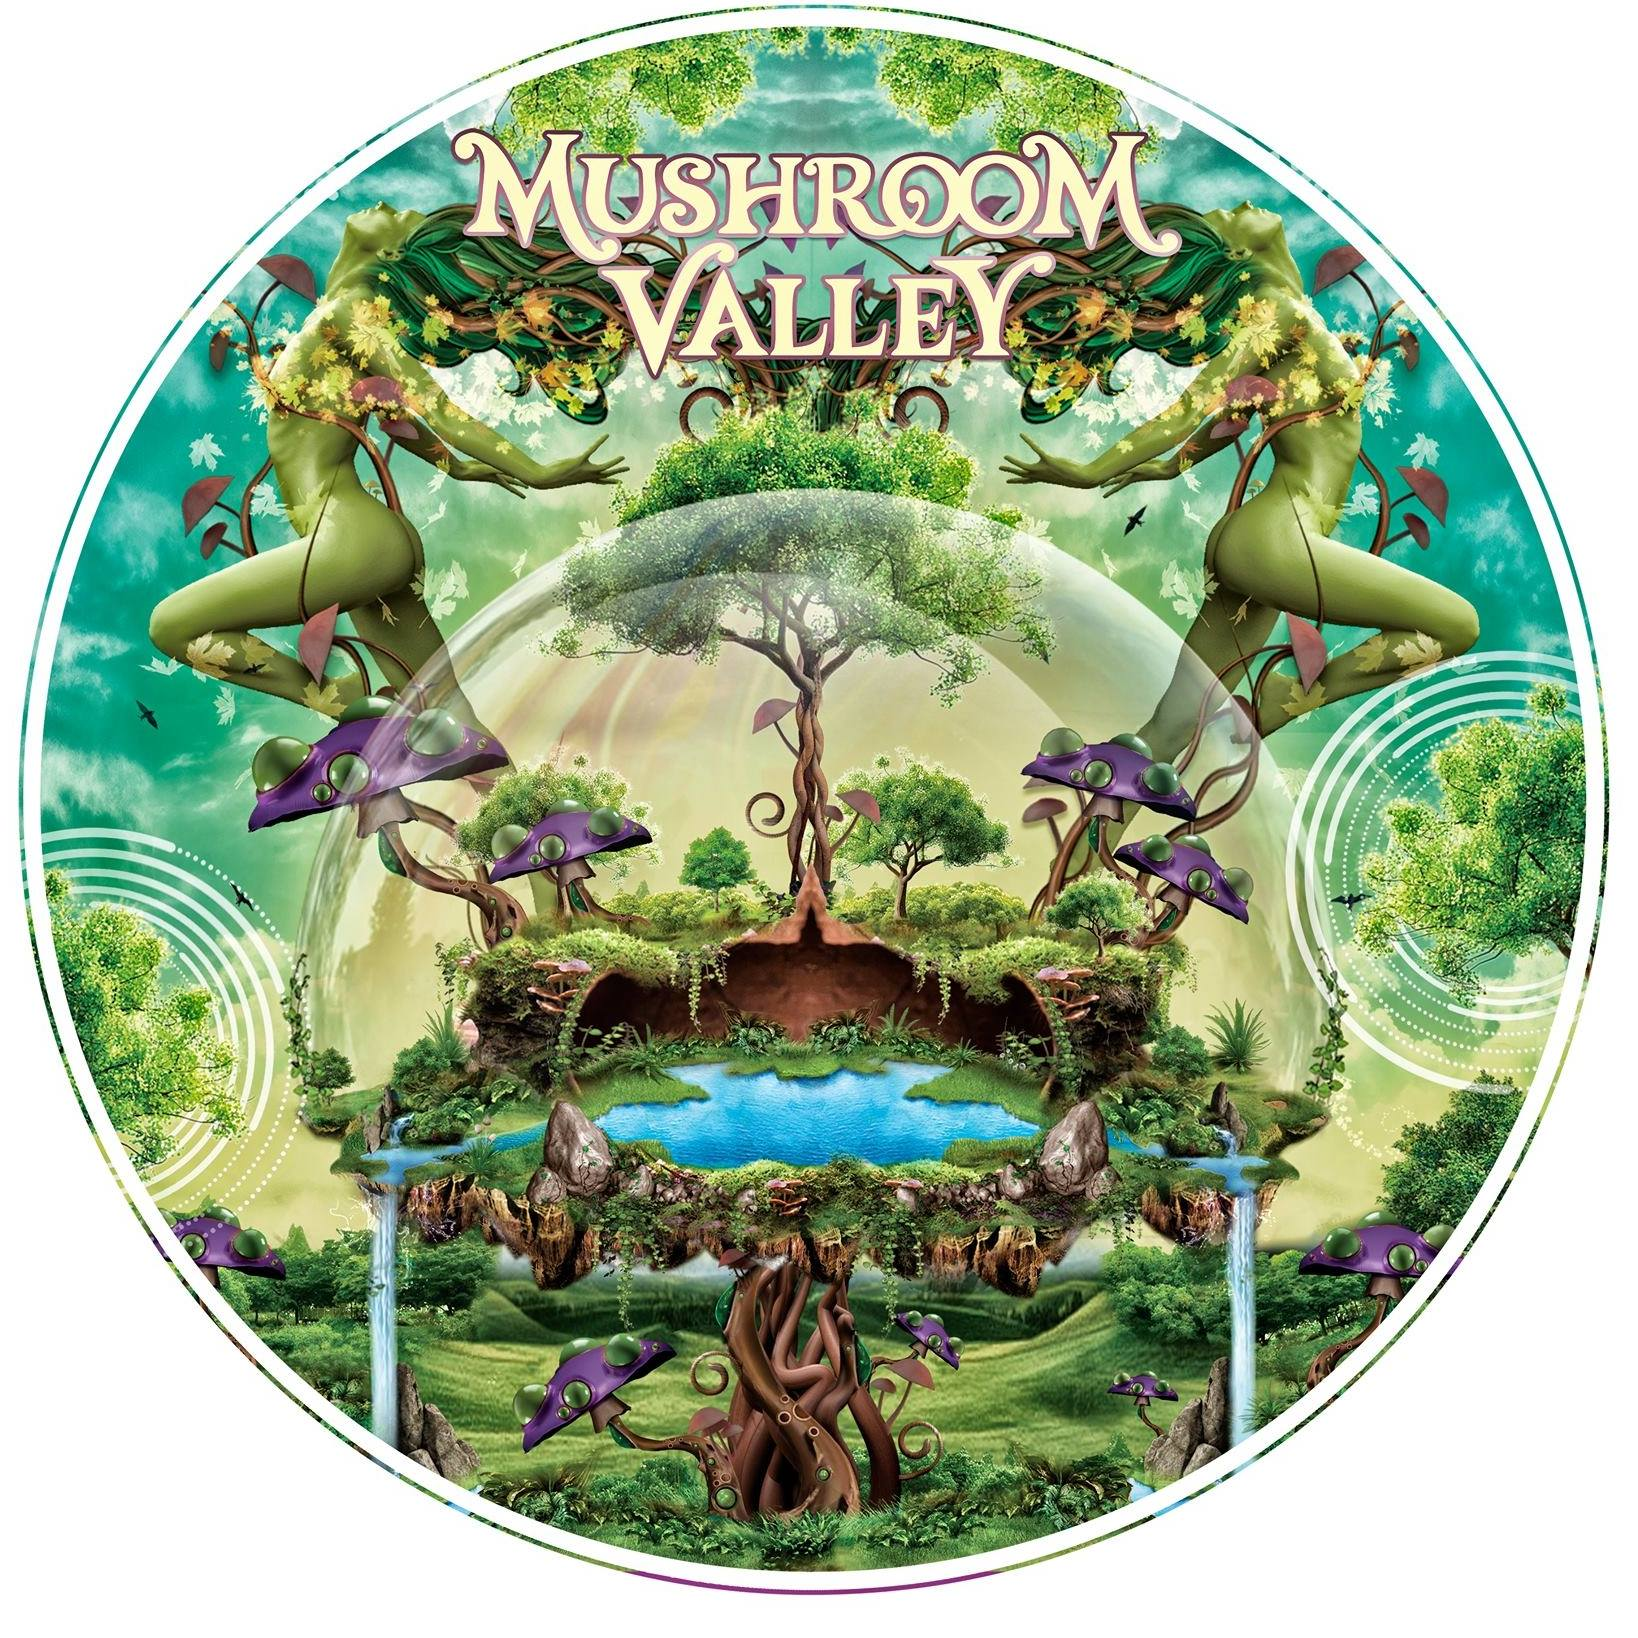 Mushroom Valley Festival Australia